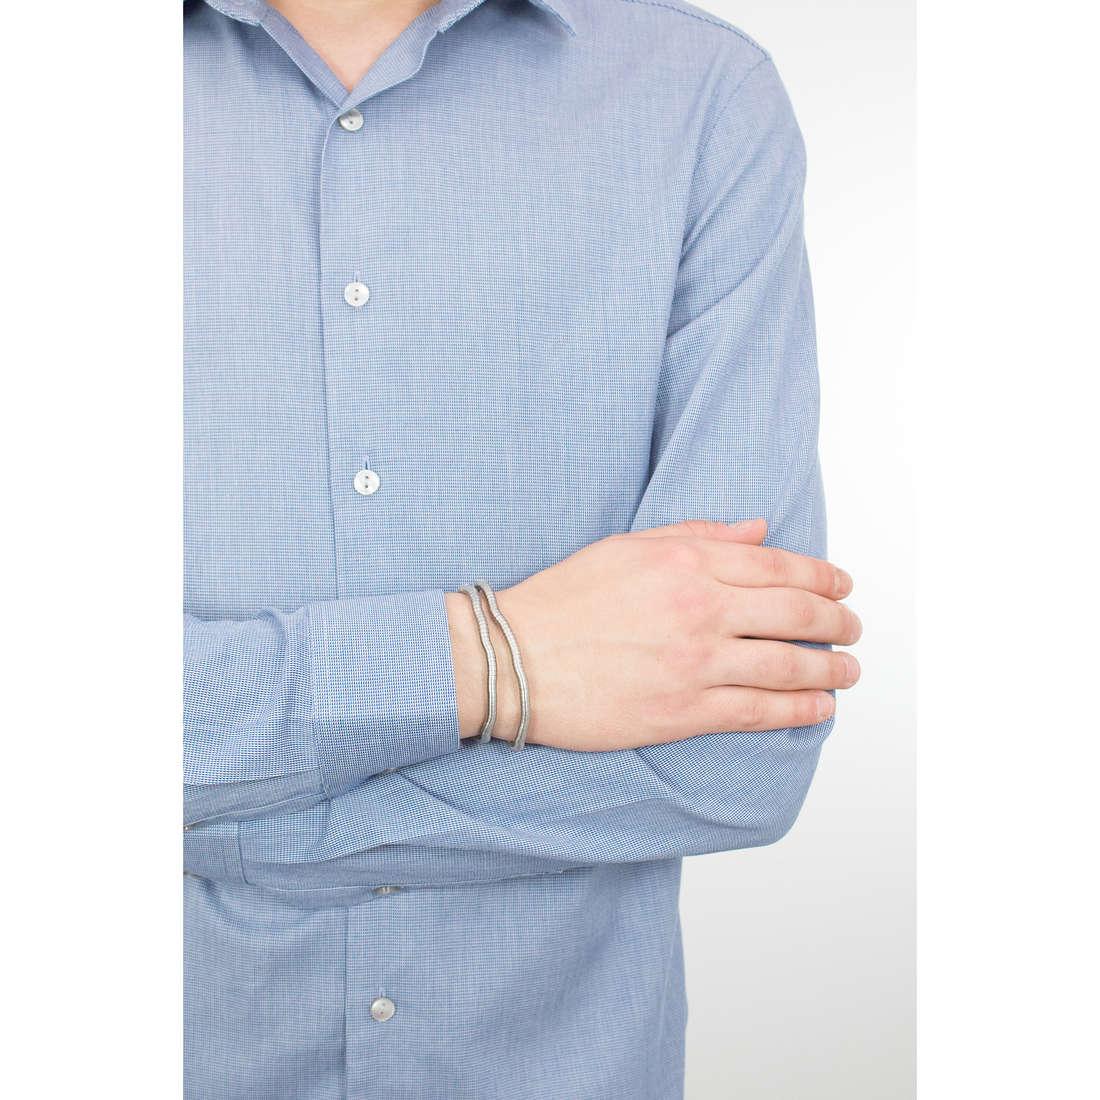 Breil bracciali Snake uomo TJ1281 indosso